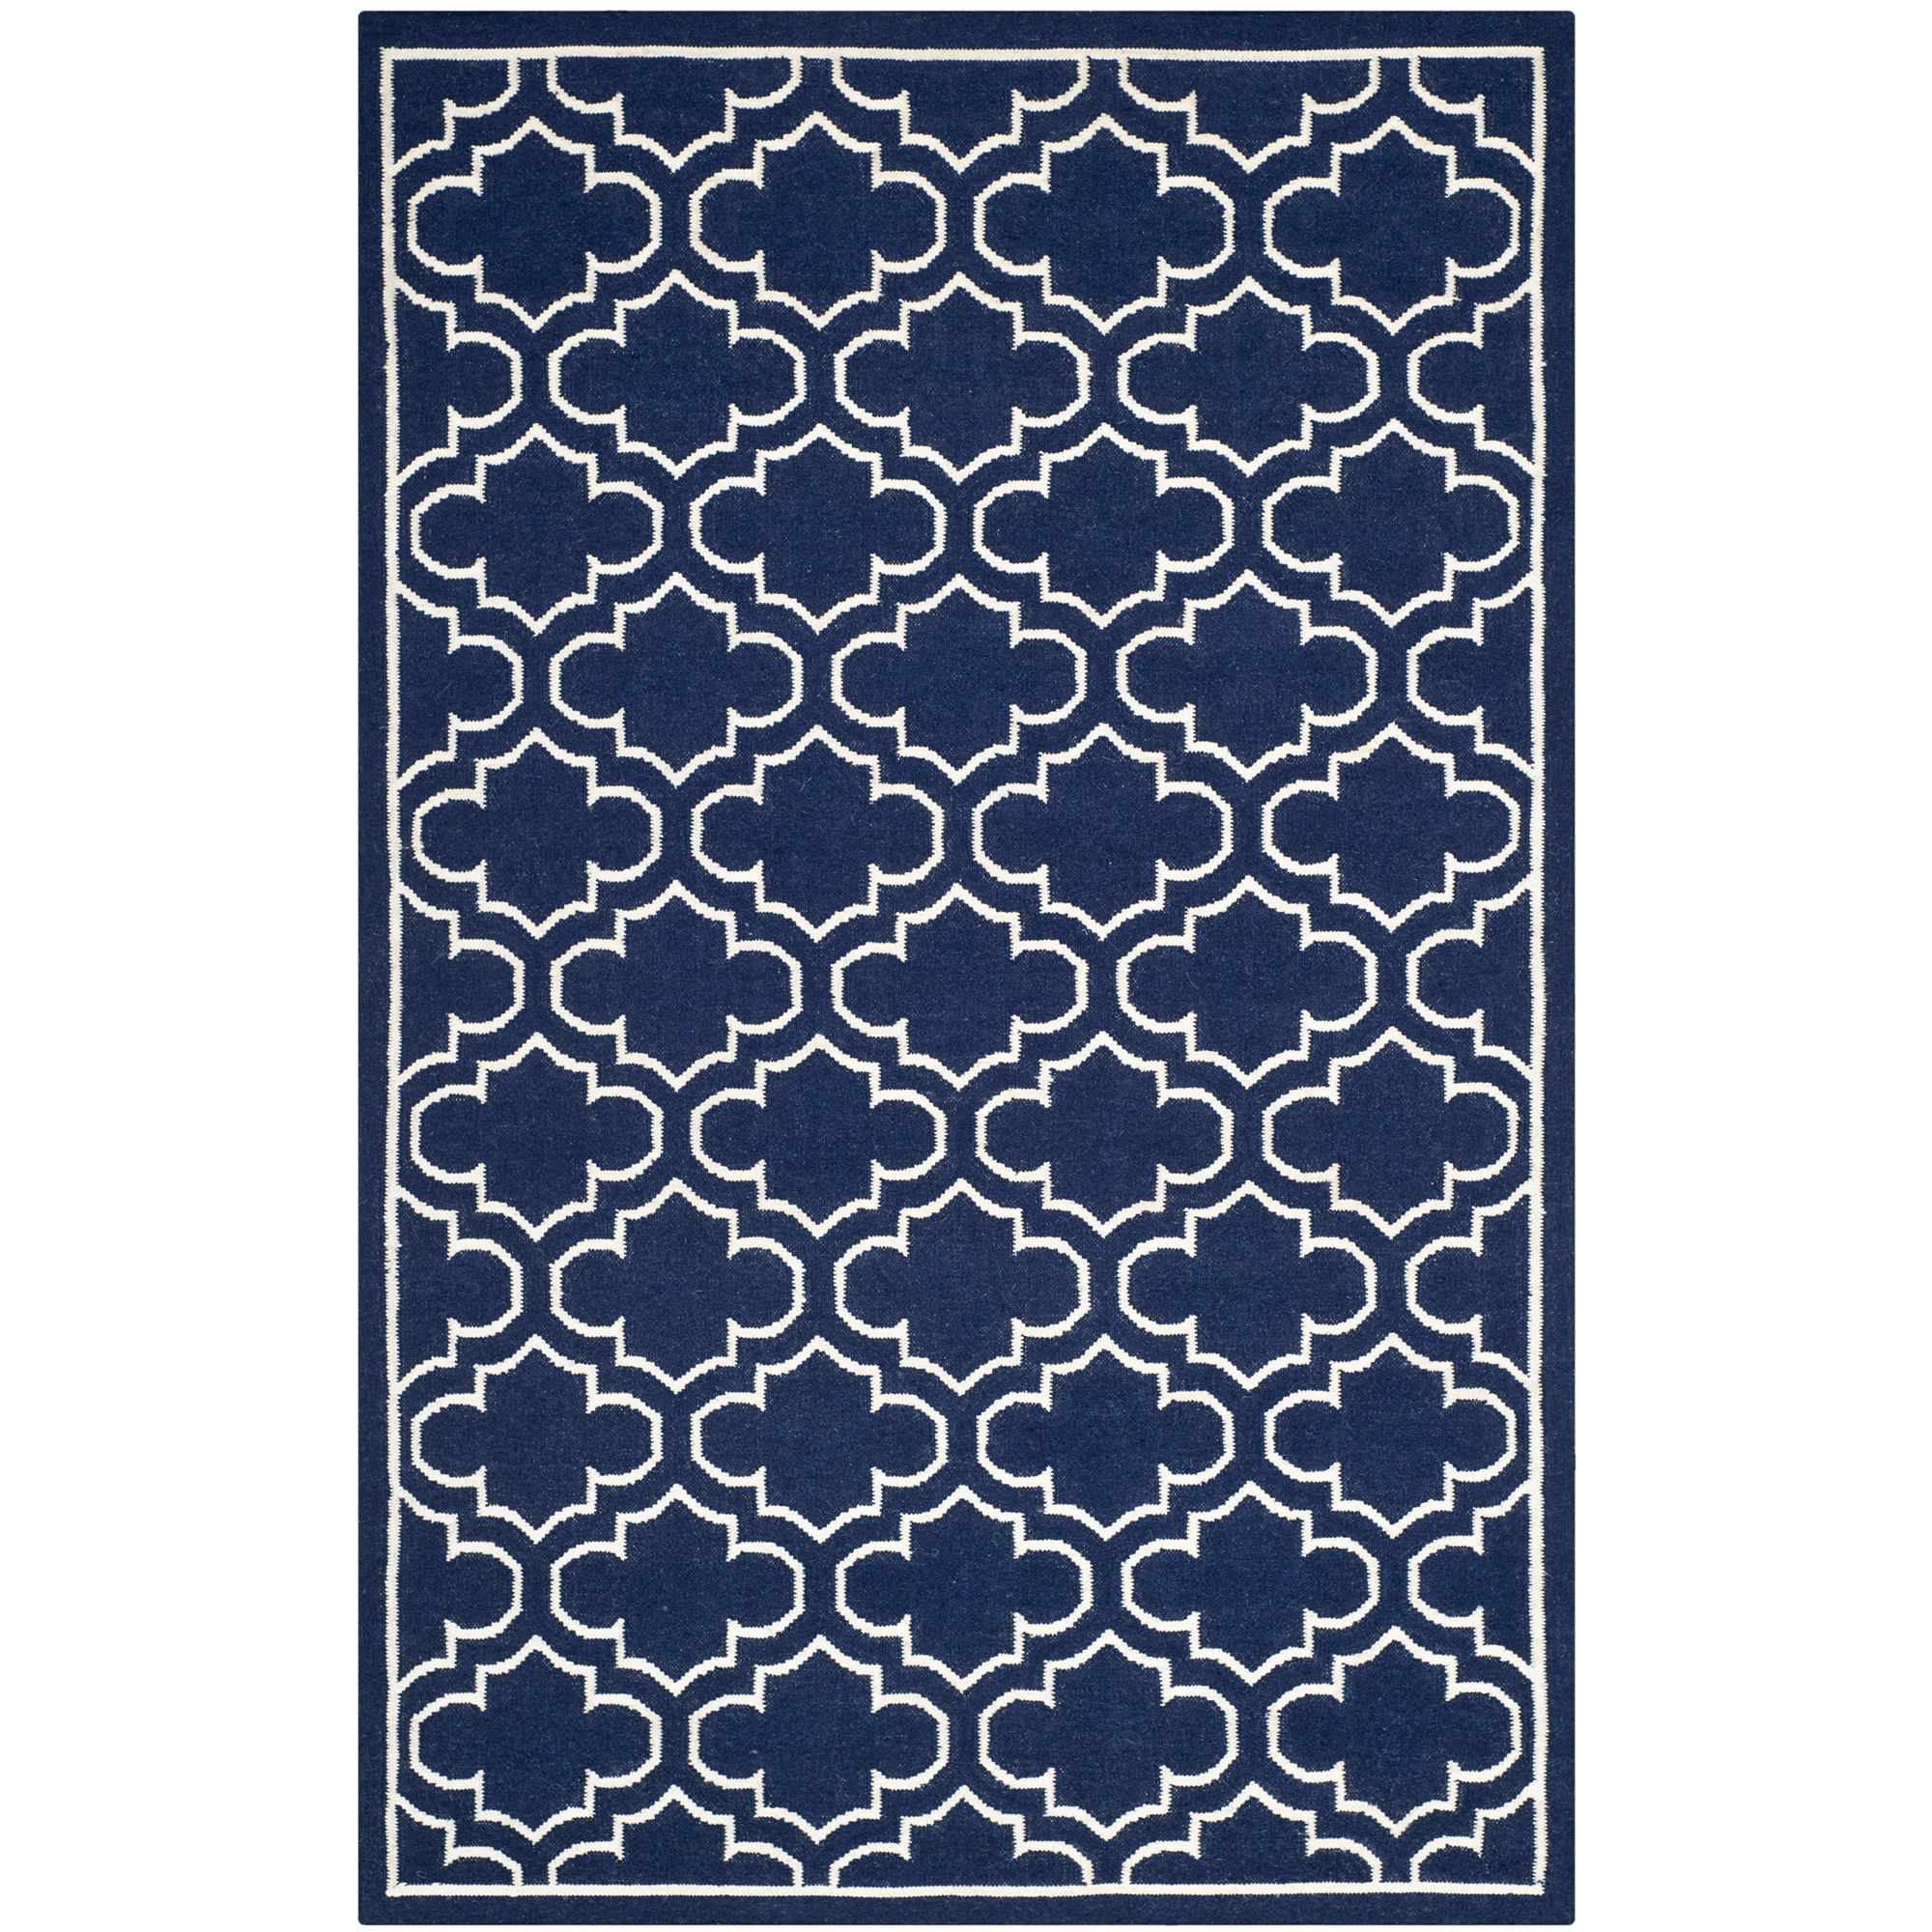 Safavieh Wayra Hand Woven Flat Weave Area Rug